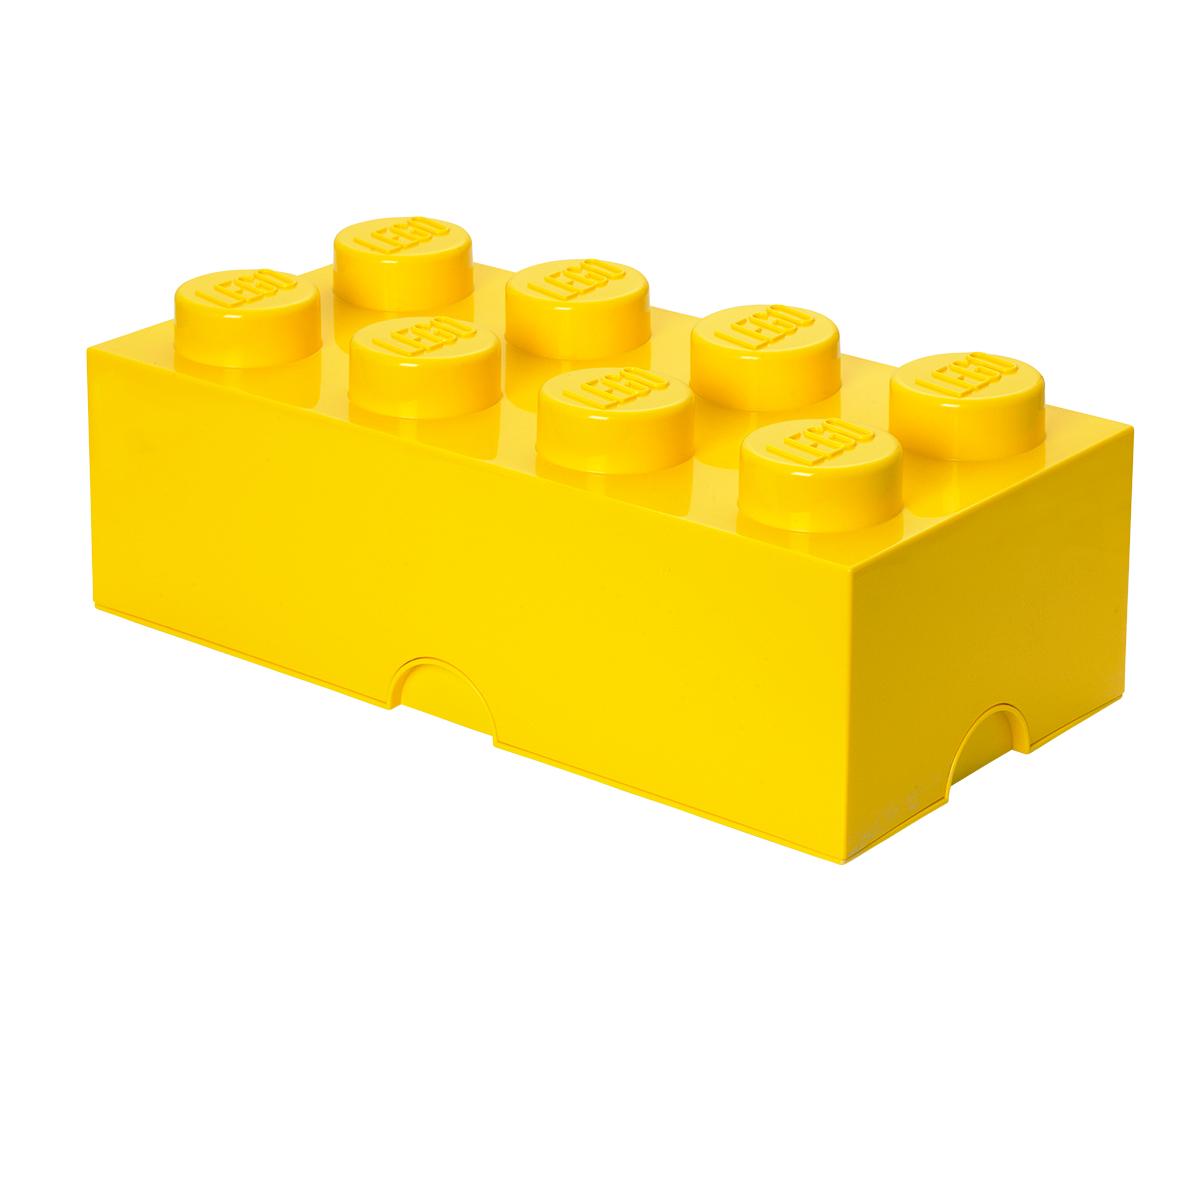 LEGO 4004 Aufbewahrungsbox Blau